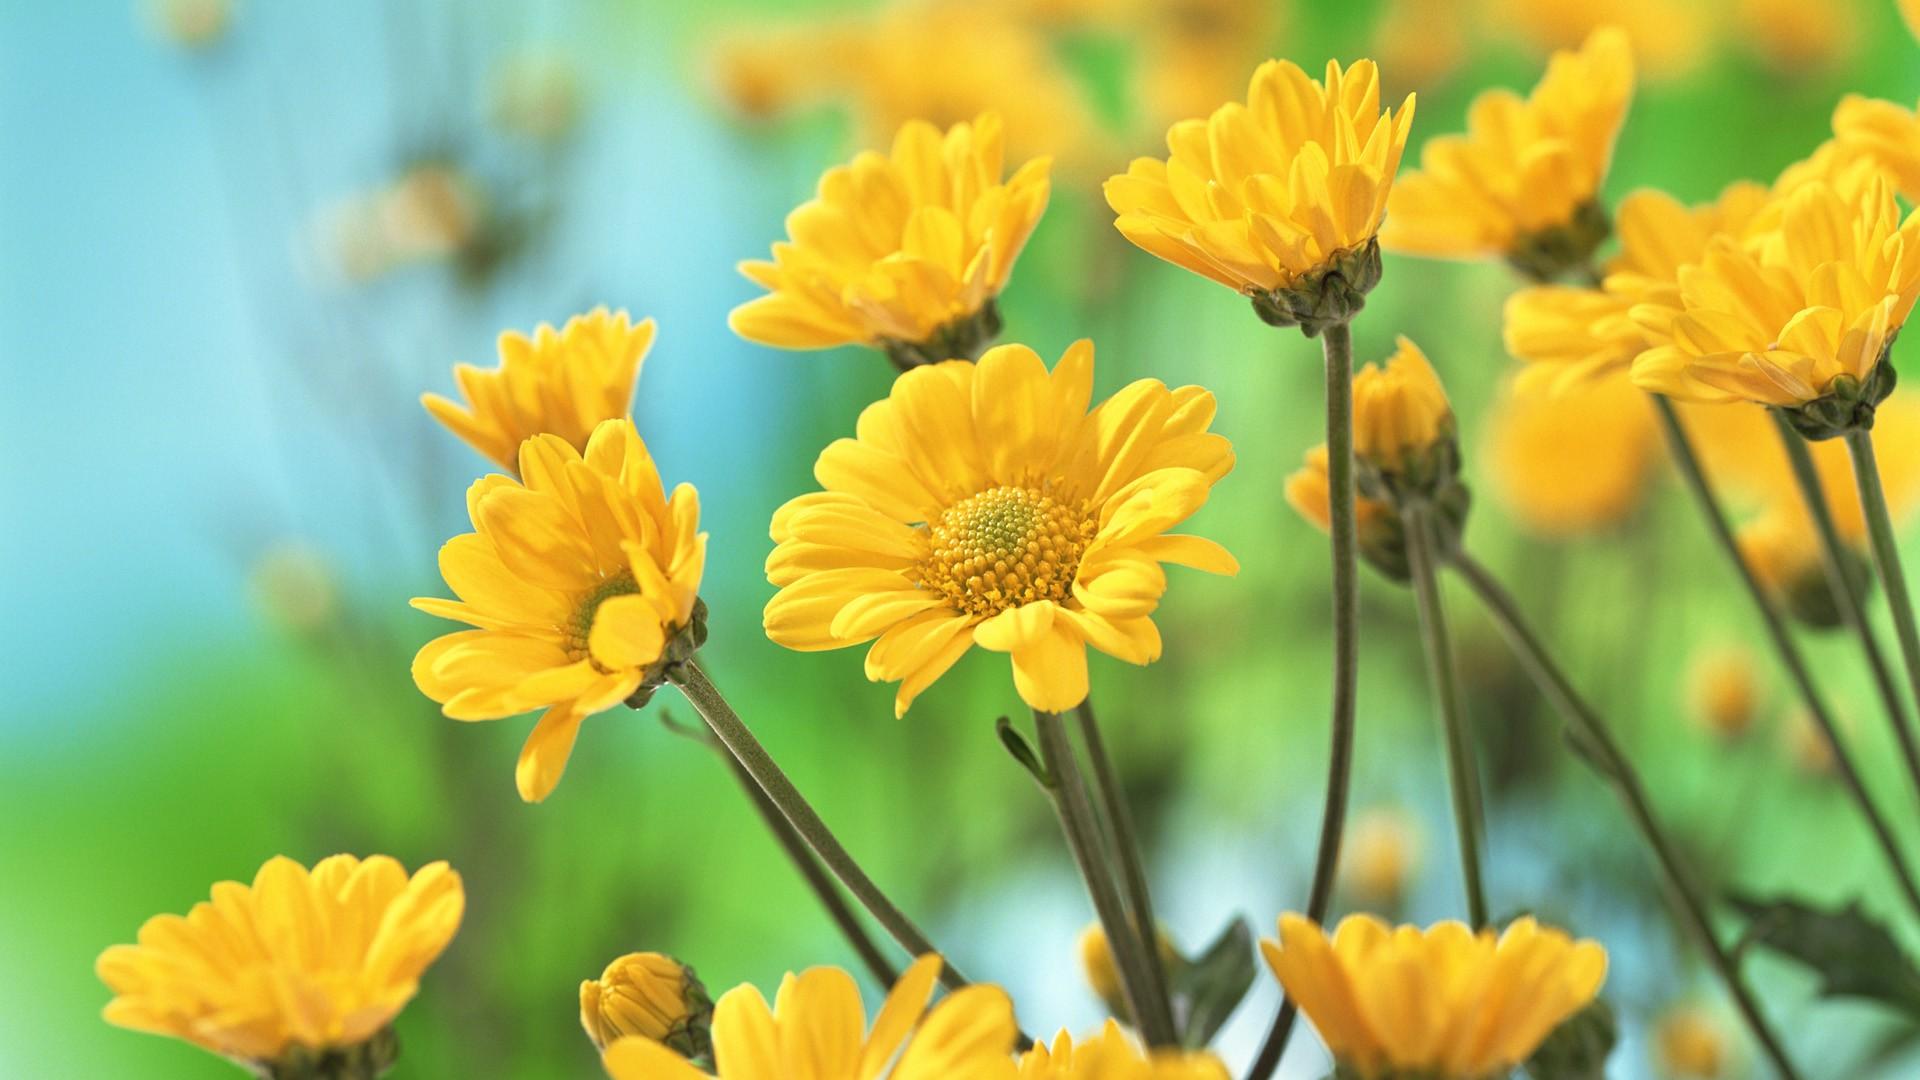 Hd wallpaper yellow flowers - Yellow Flower Wallpaper